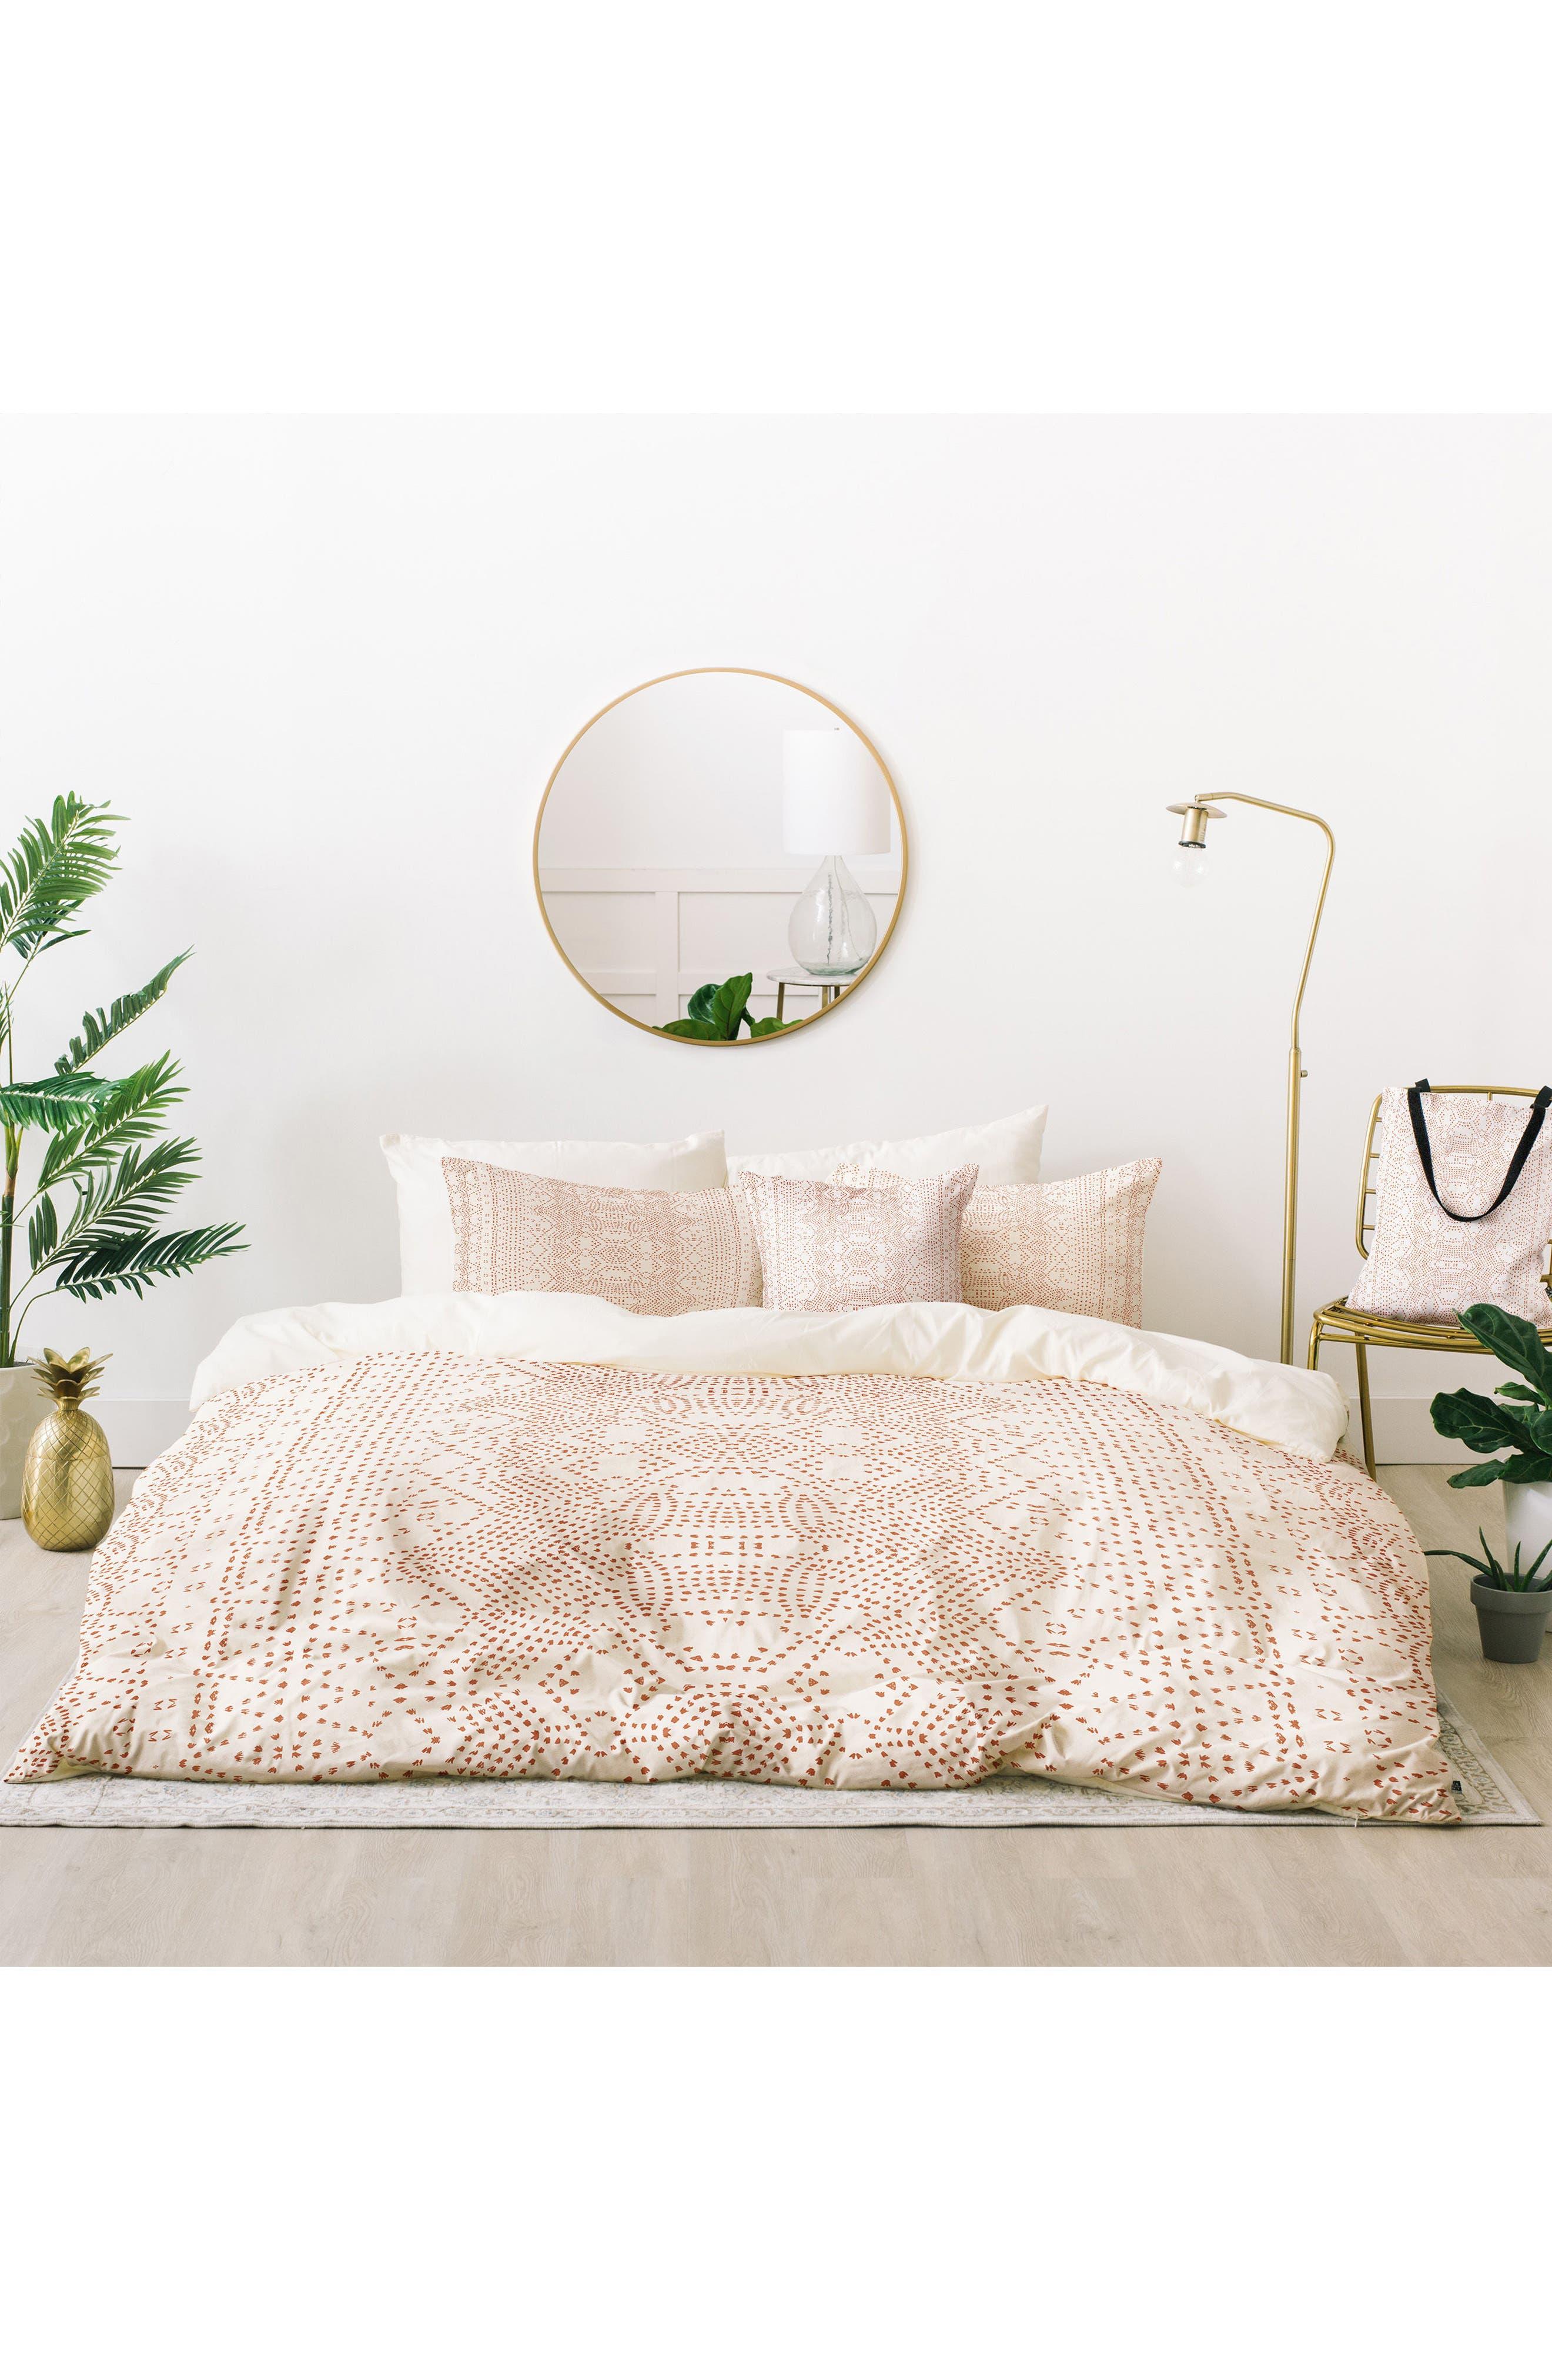 deny designs holli zollinger marrakeshi bed in a bag duvet cover sham u0026 accent pillow